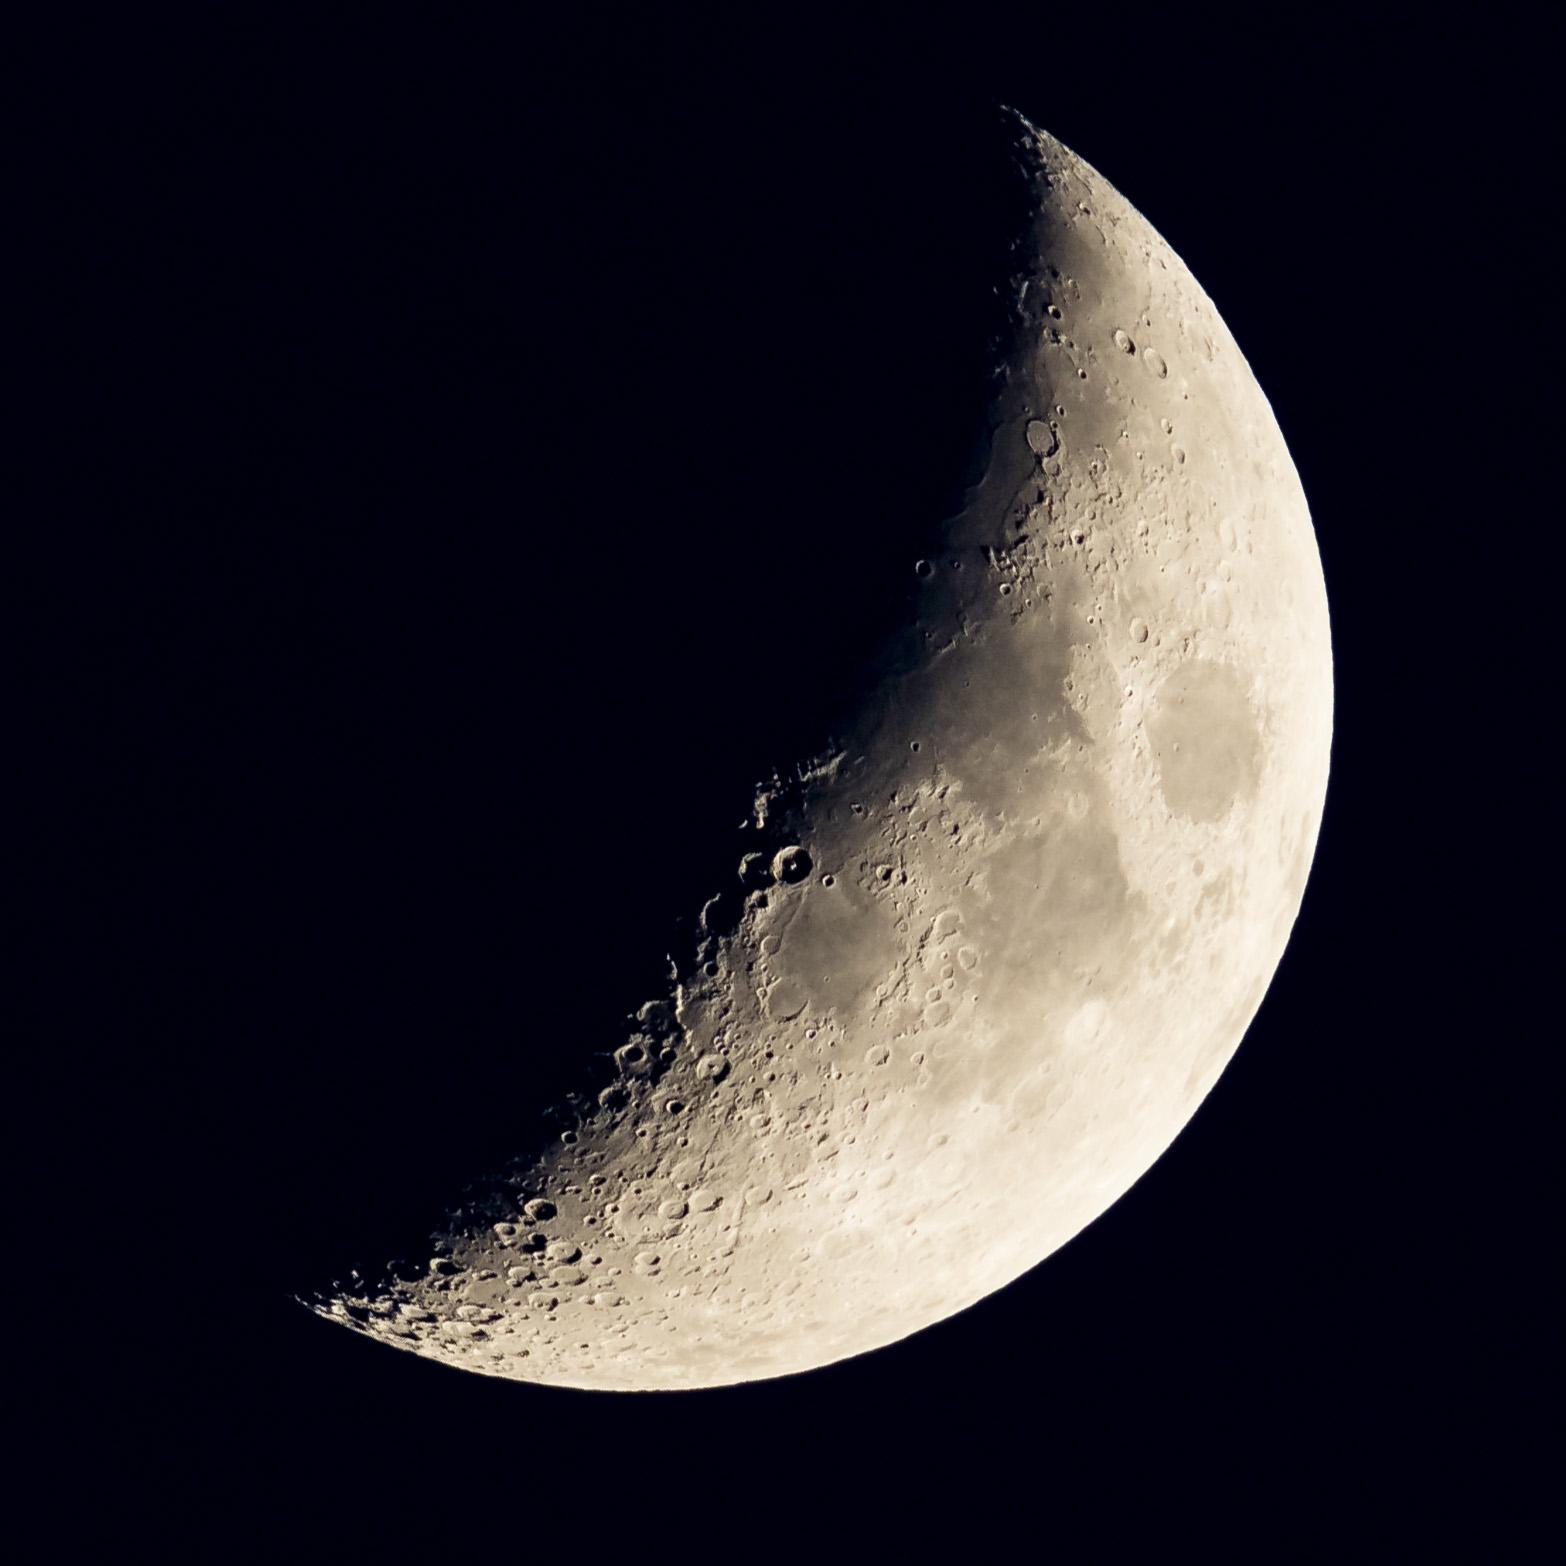 Lune_20180816-006.jpg